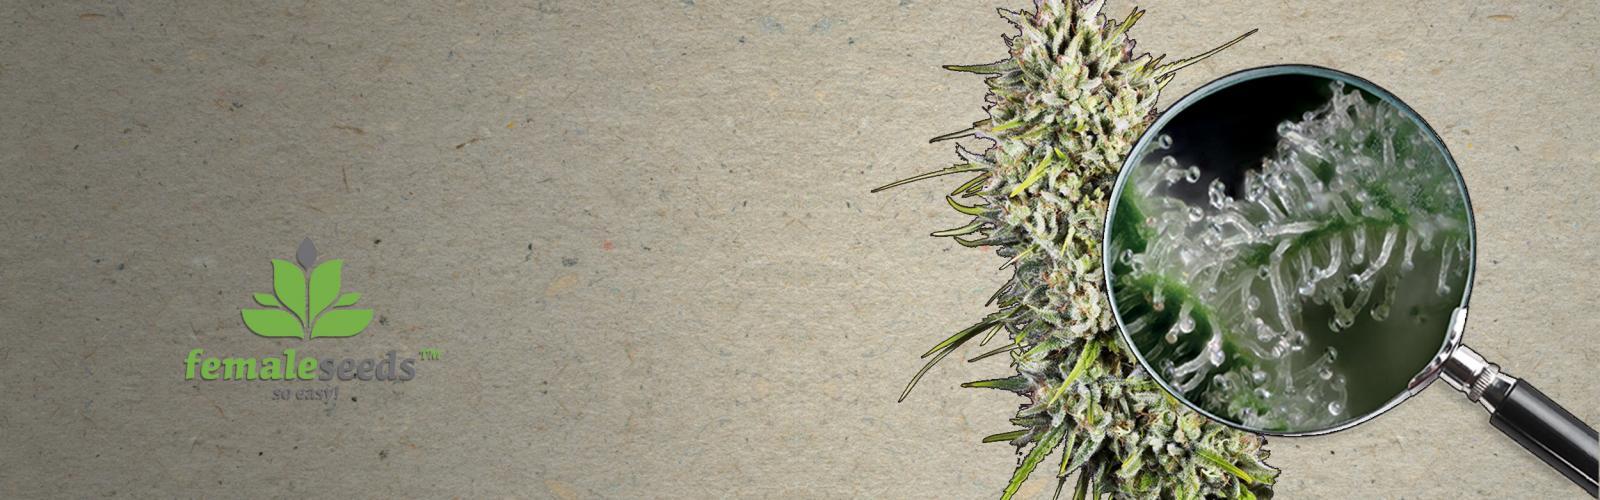 Semillas de Marihuana Autoflorecientes Female Seeds